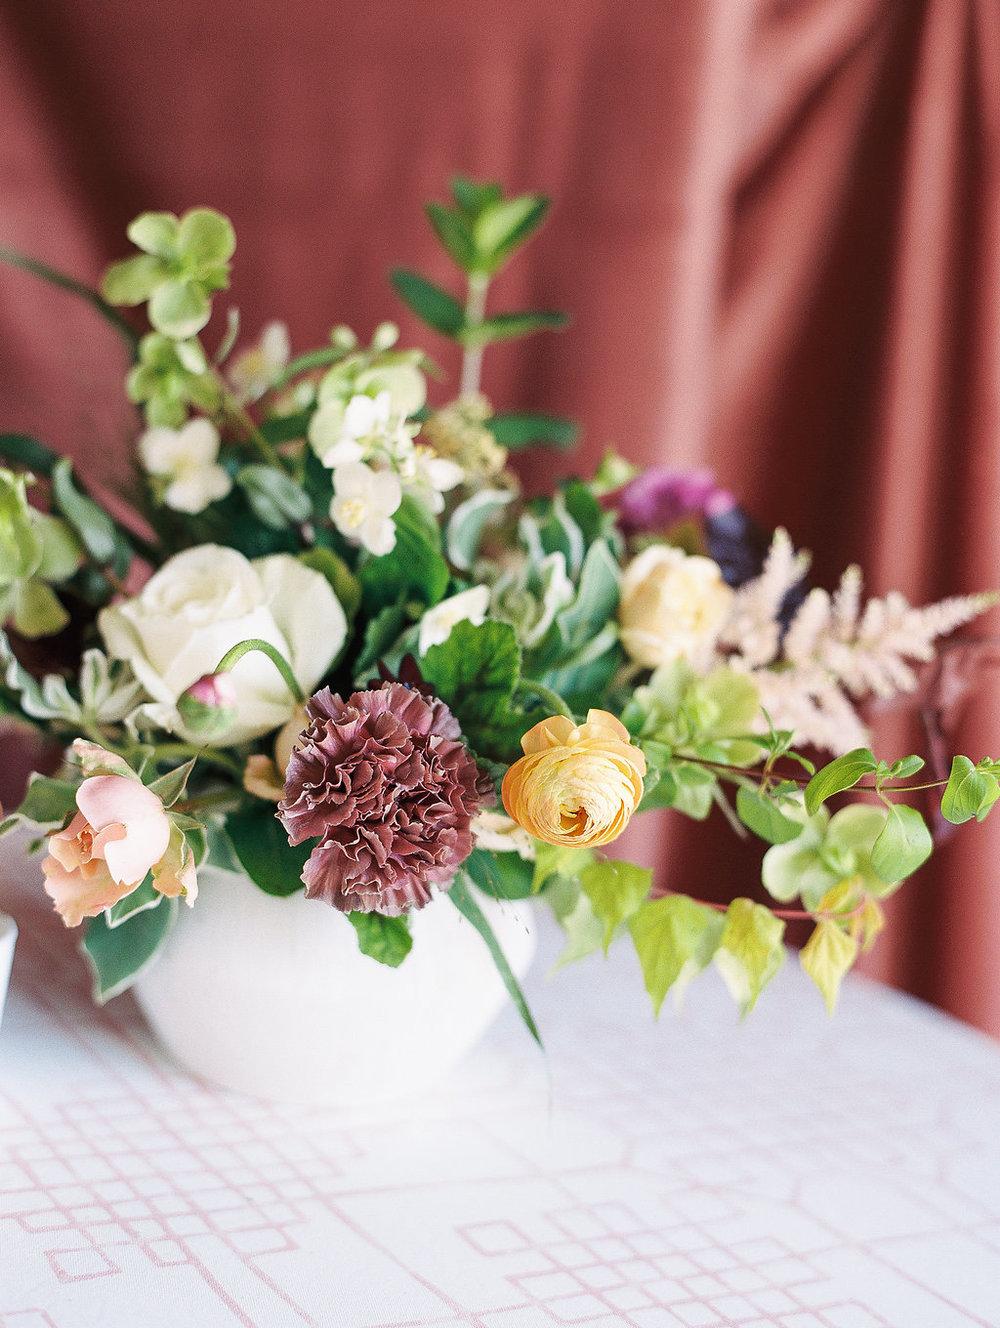 zimmerman-events-arkansas-geometric-wedding.jpg